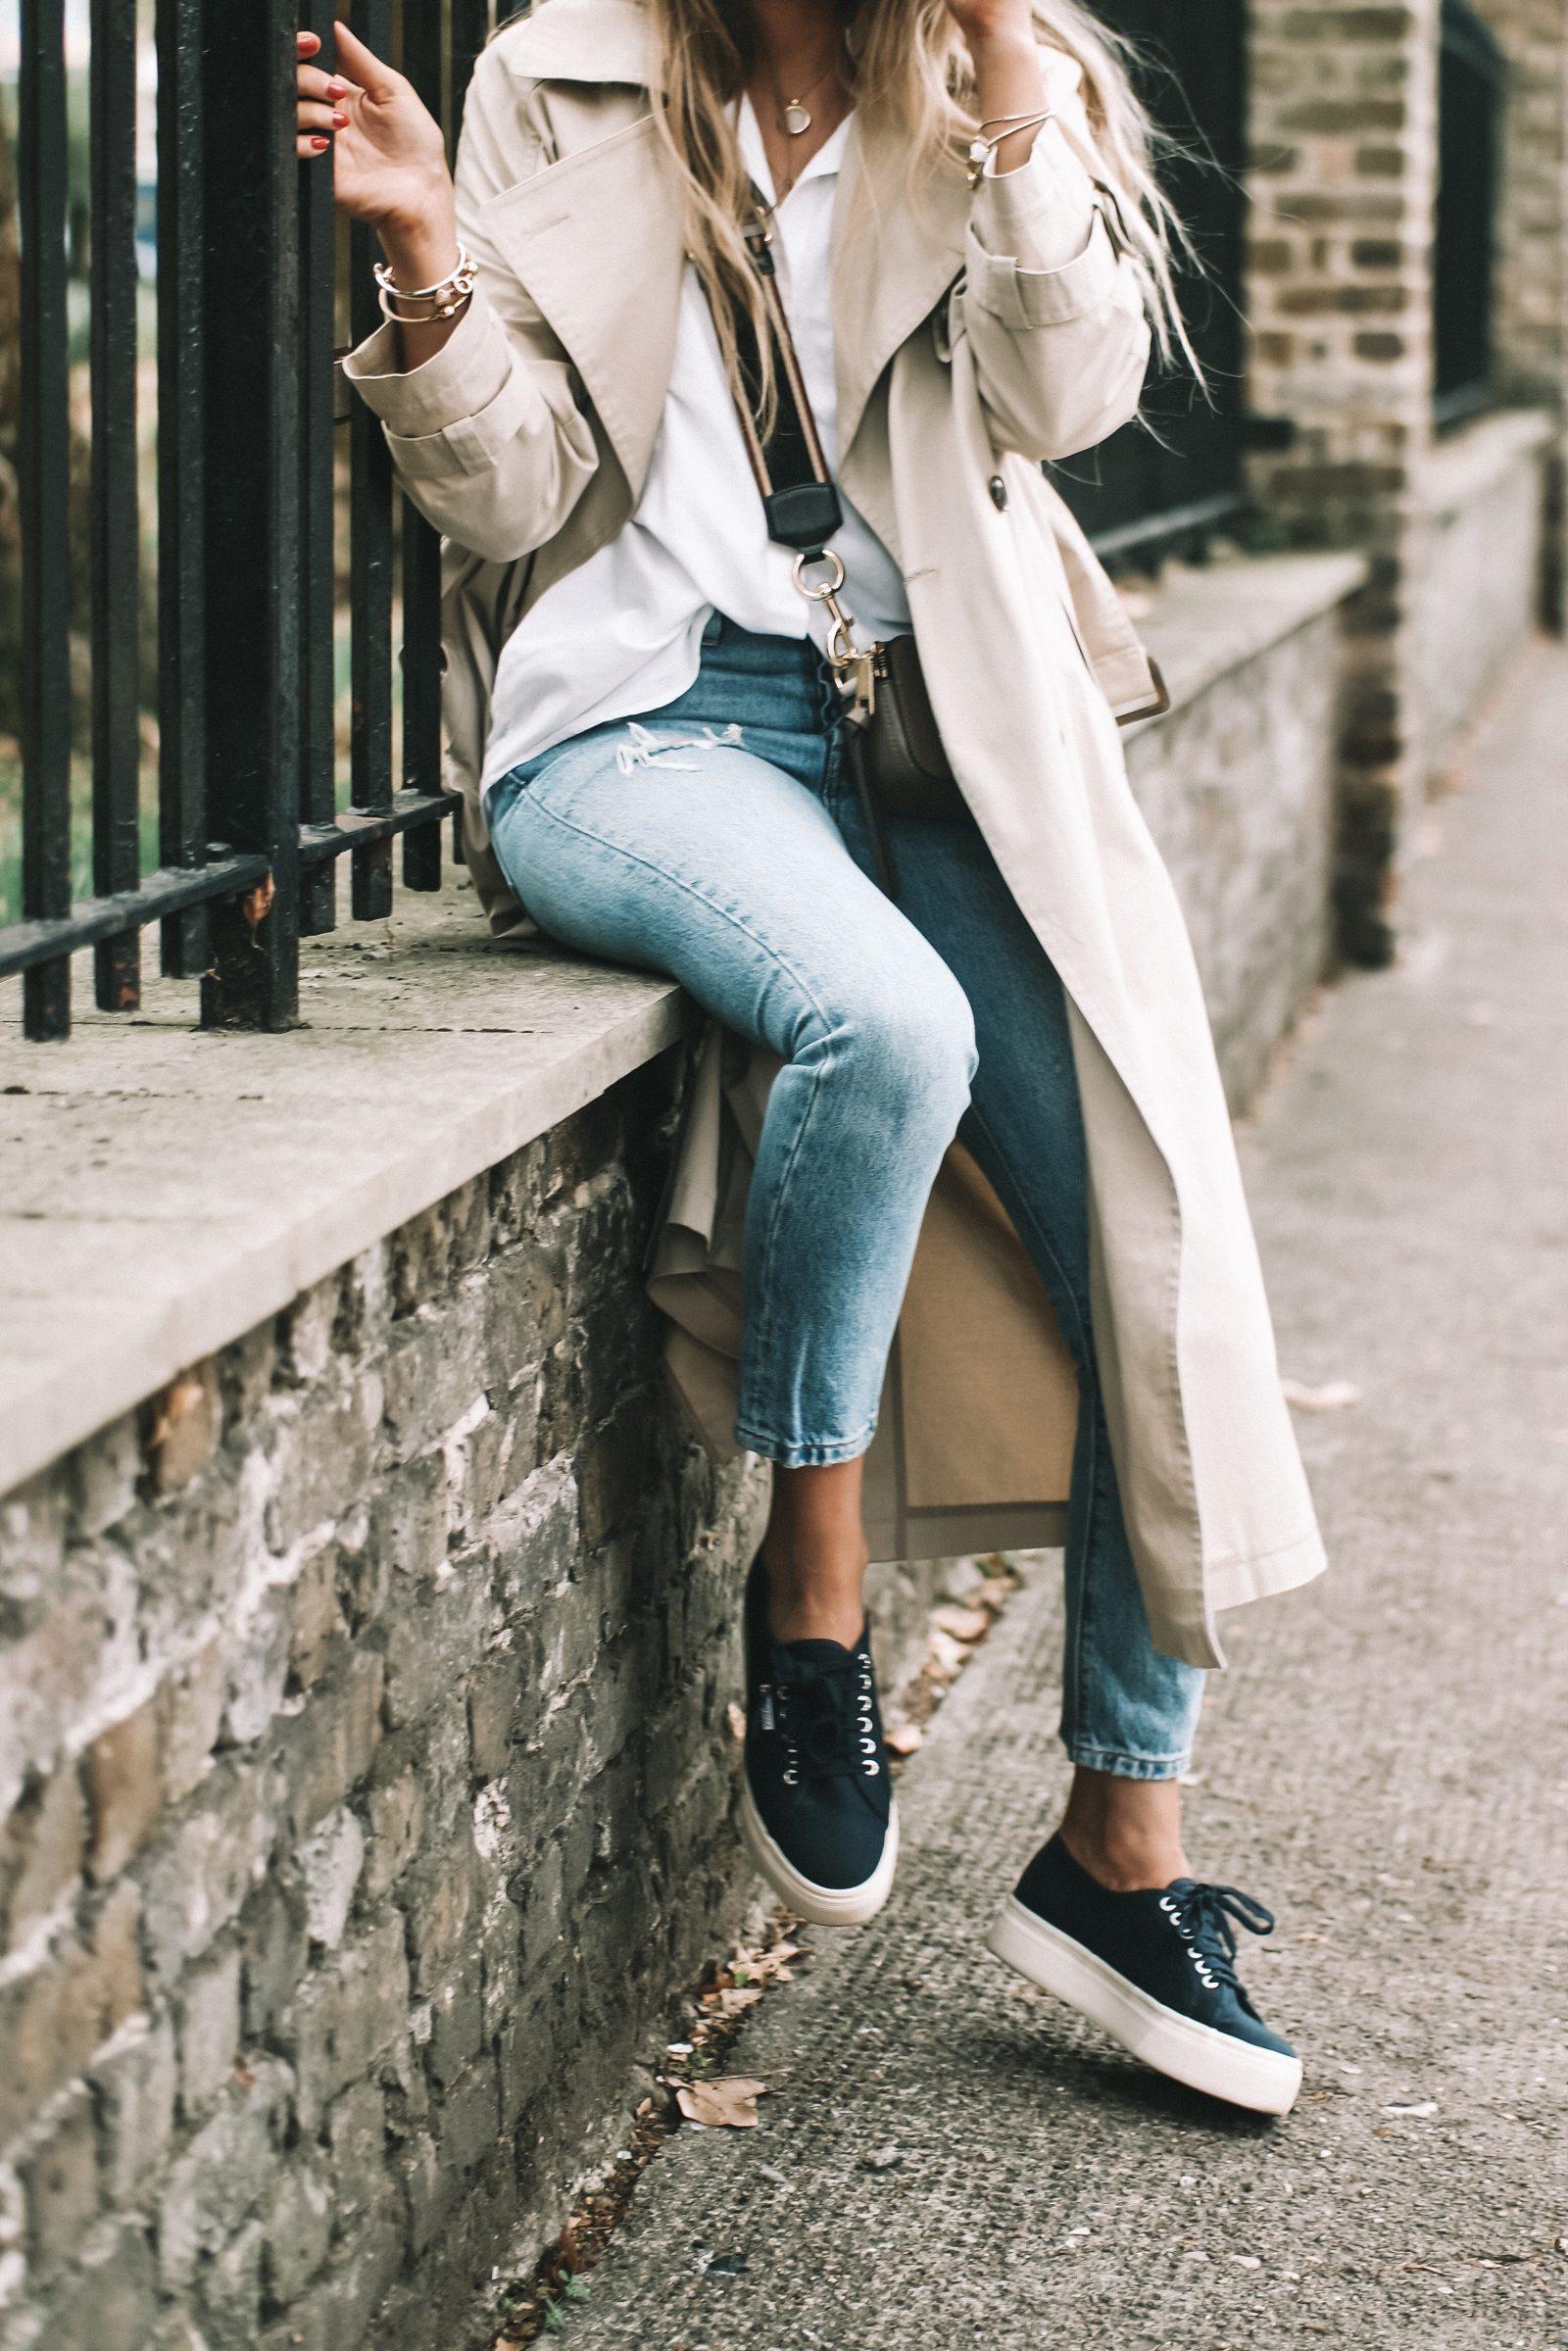 LFW Street Style - Levis Skinny Jeans